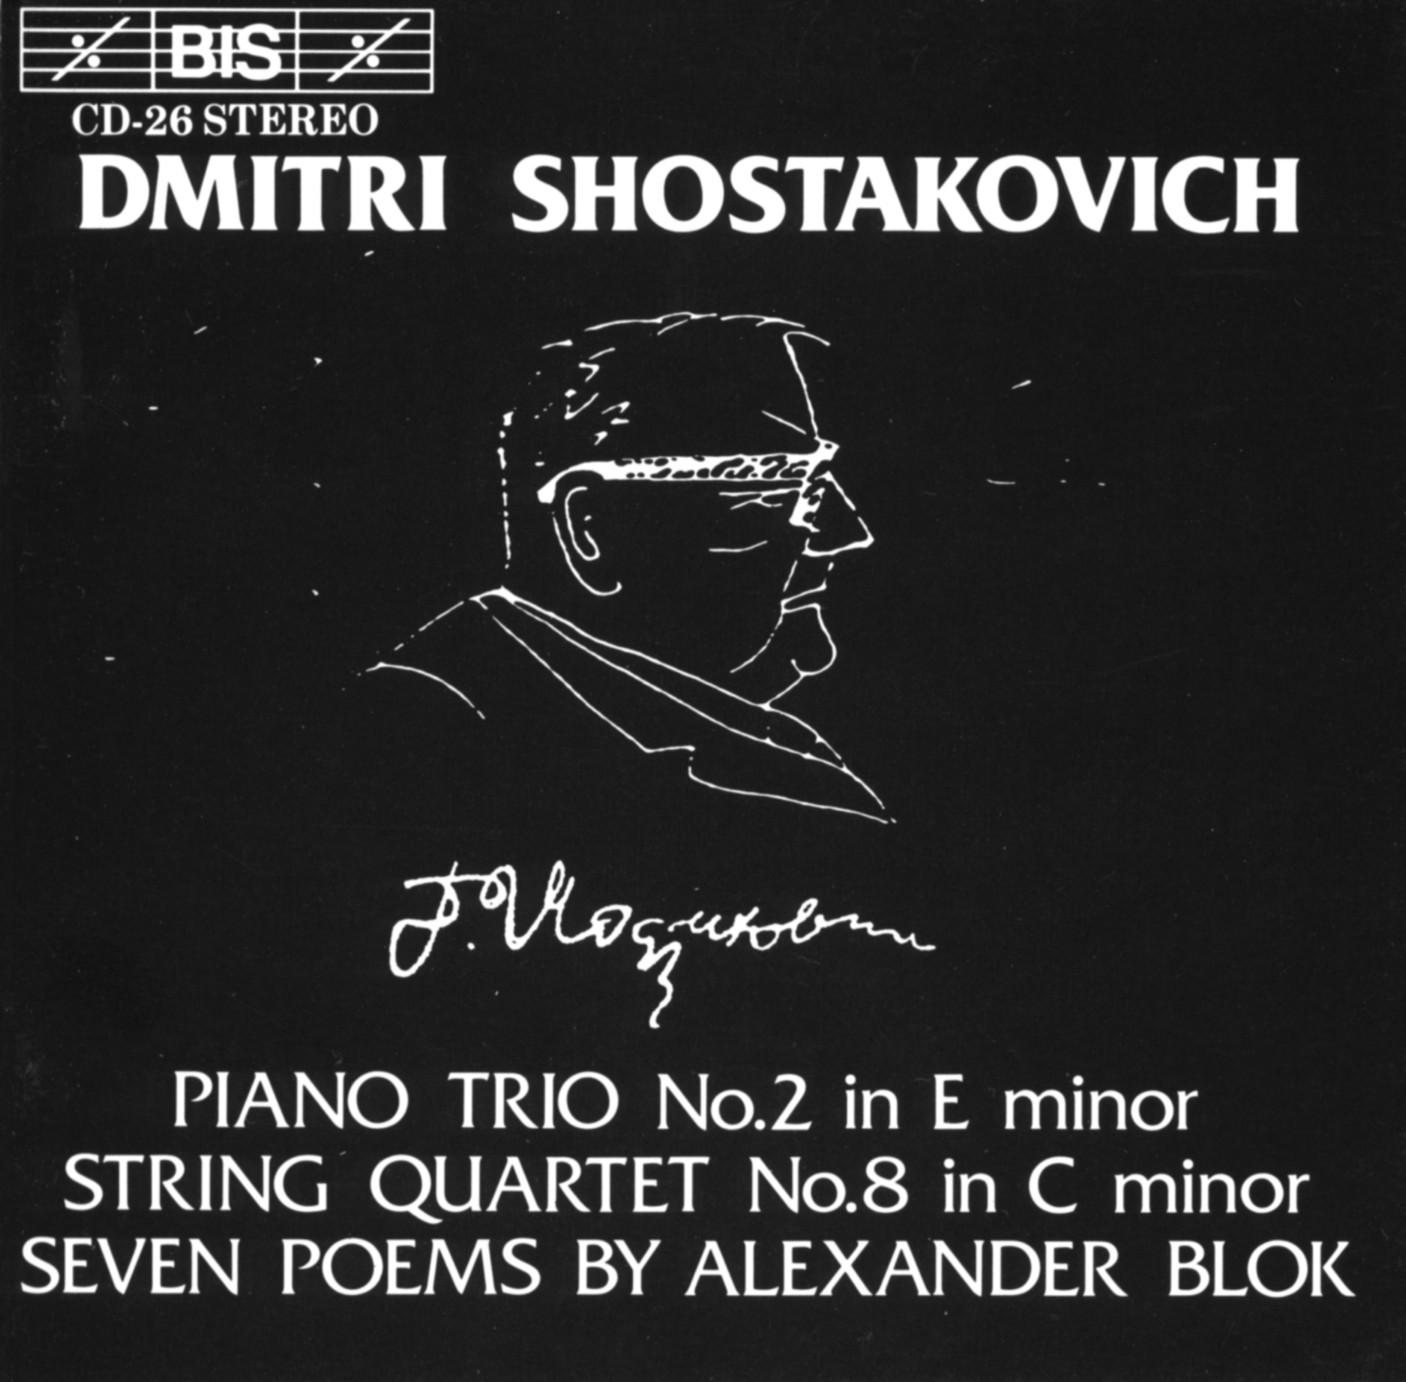 analysis shostakovich piano trio no Shostakovich: piano trios nos 1 and 2 by dmitry shostakovich listen to classical music cds online  piano trio no 1 in c minor, .